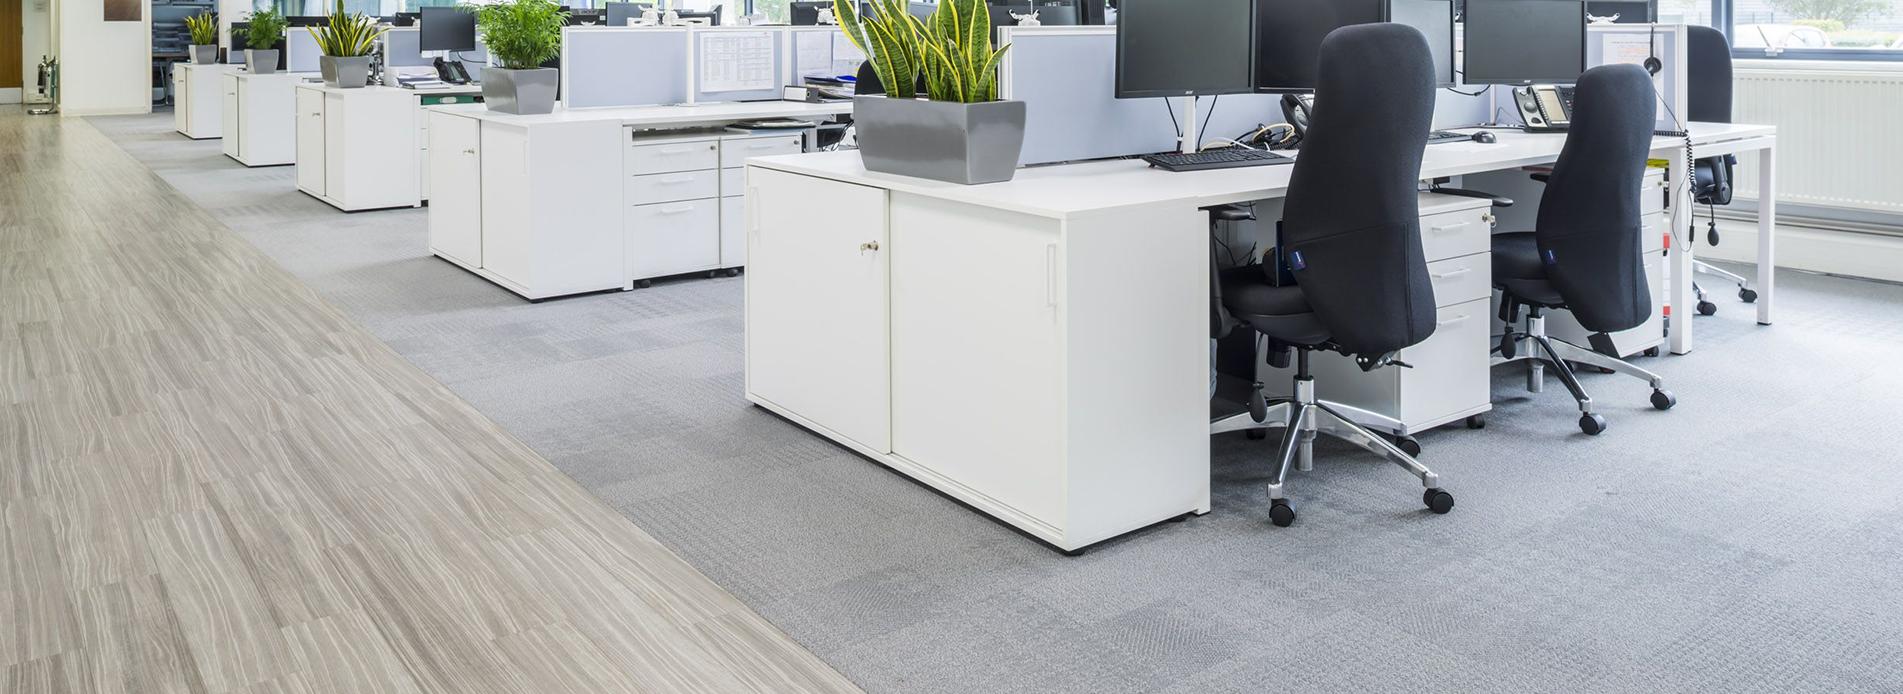 Contract Flooring 1